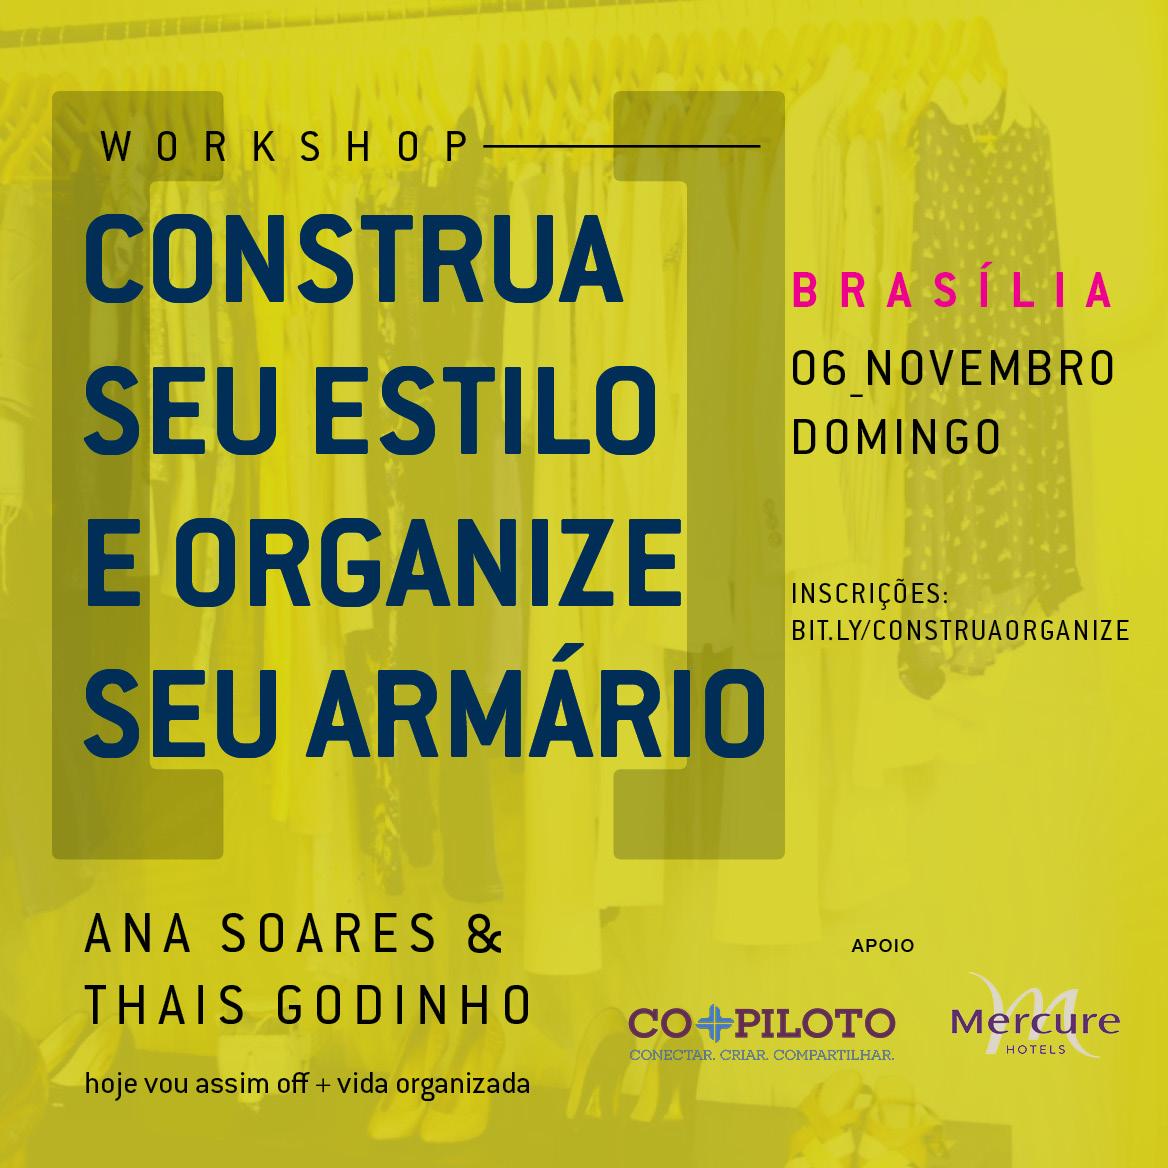 workshop-construa-organize